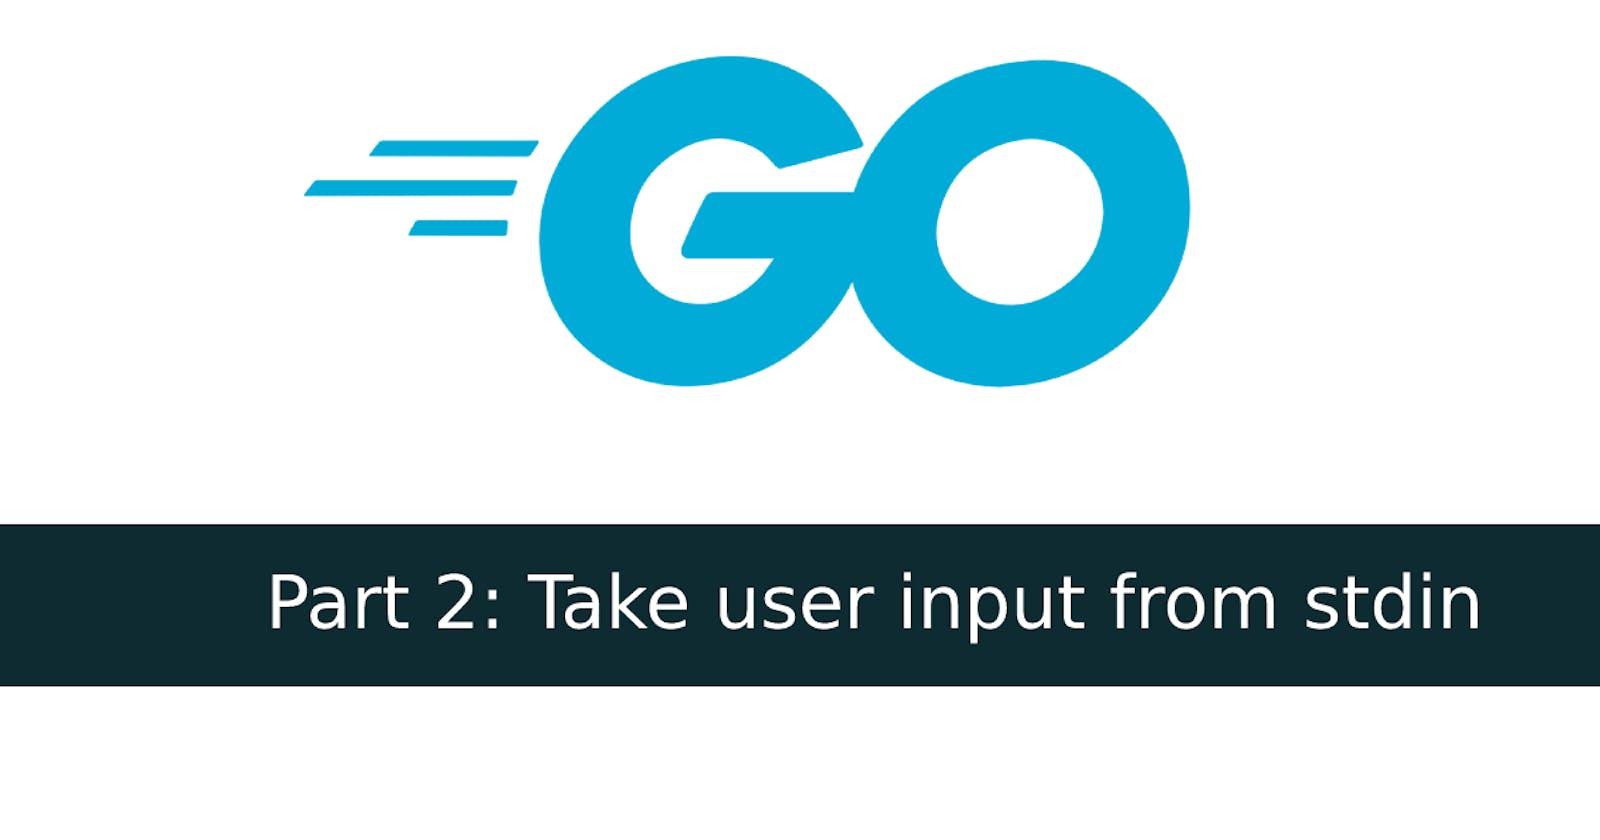 Part 2: Write a program to take user input